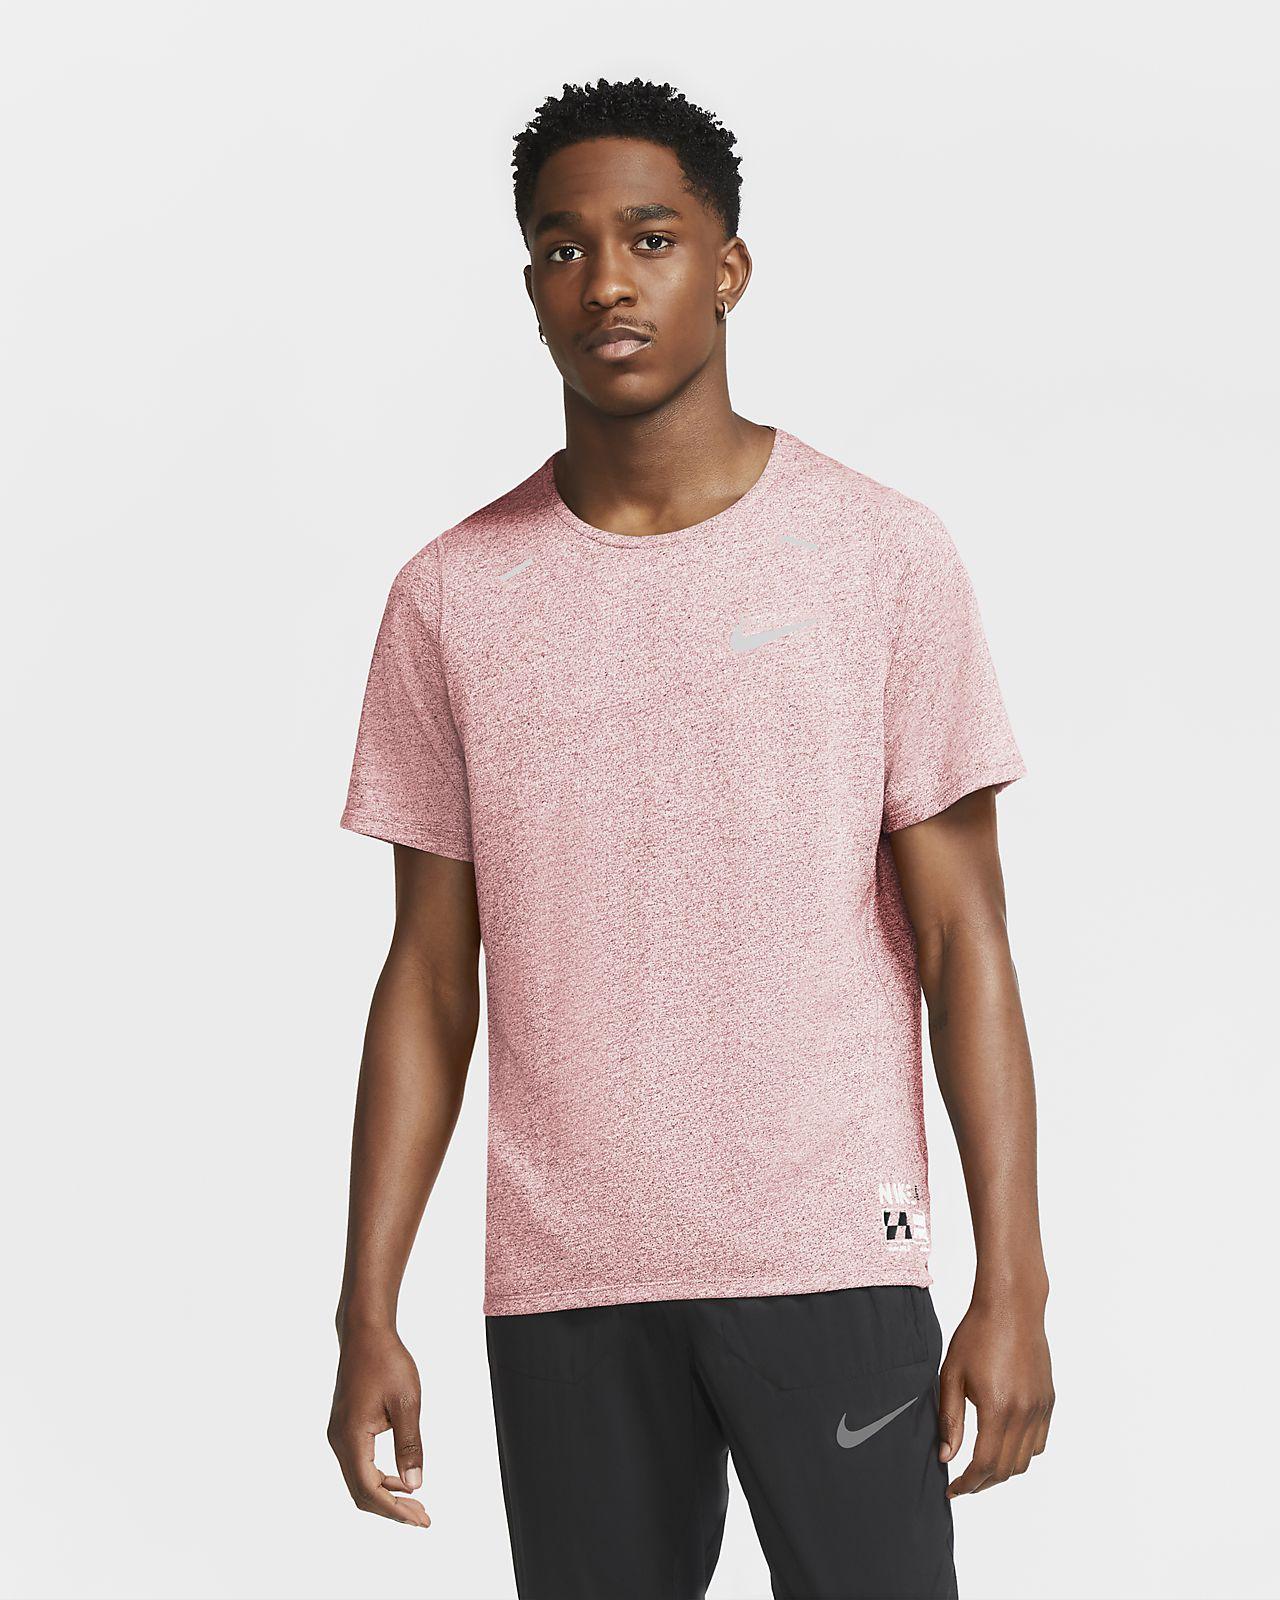 Nike Rise 365 Future Fast Men's Running Top